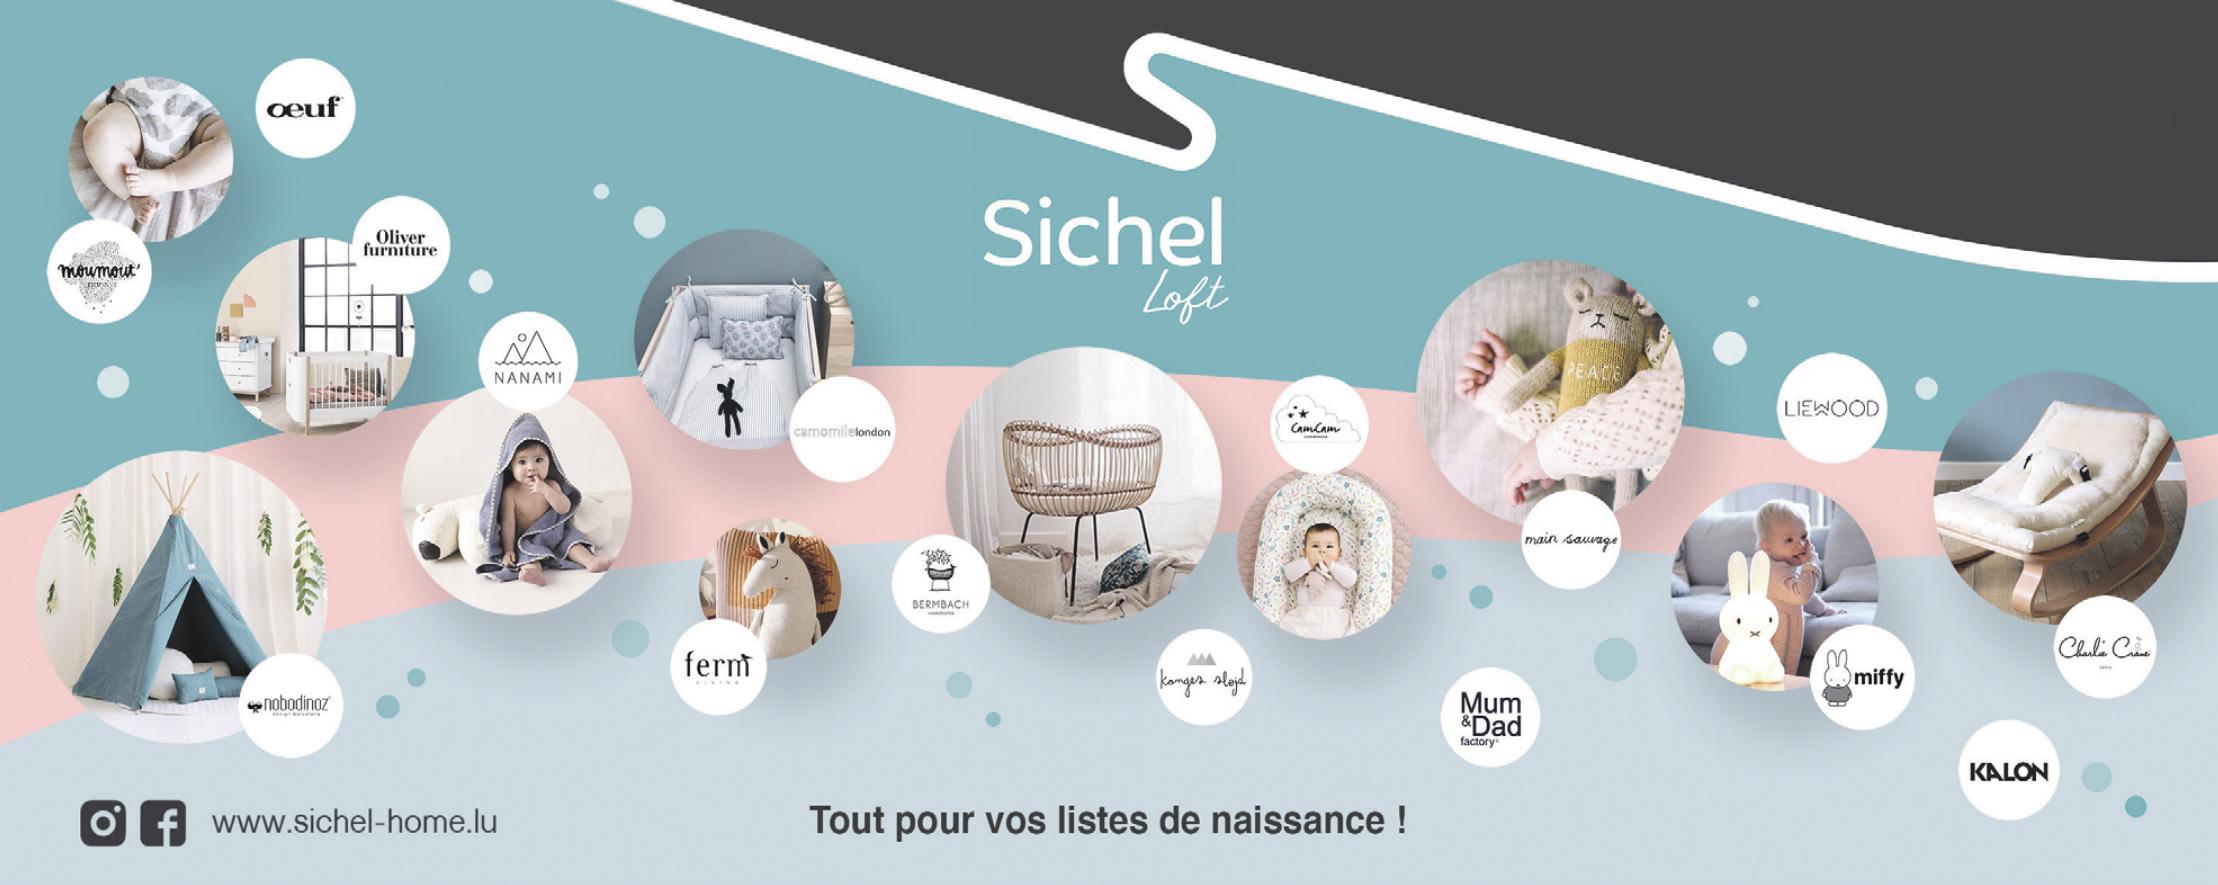 Sichel Loft